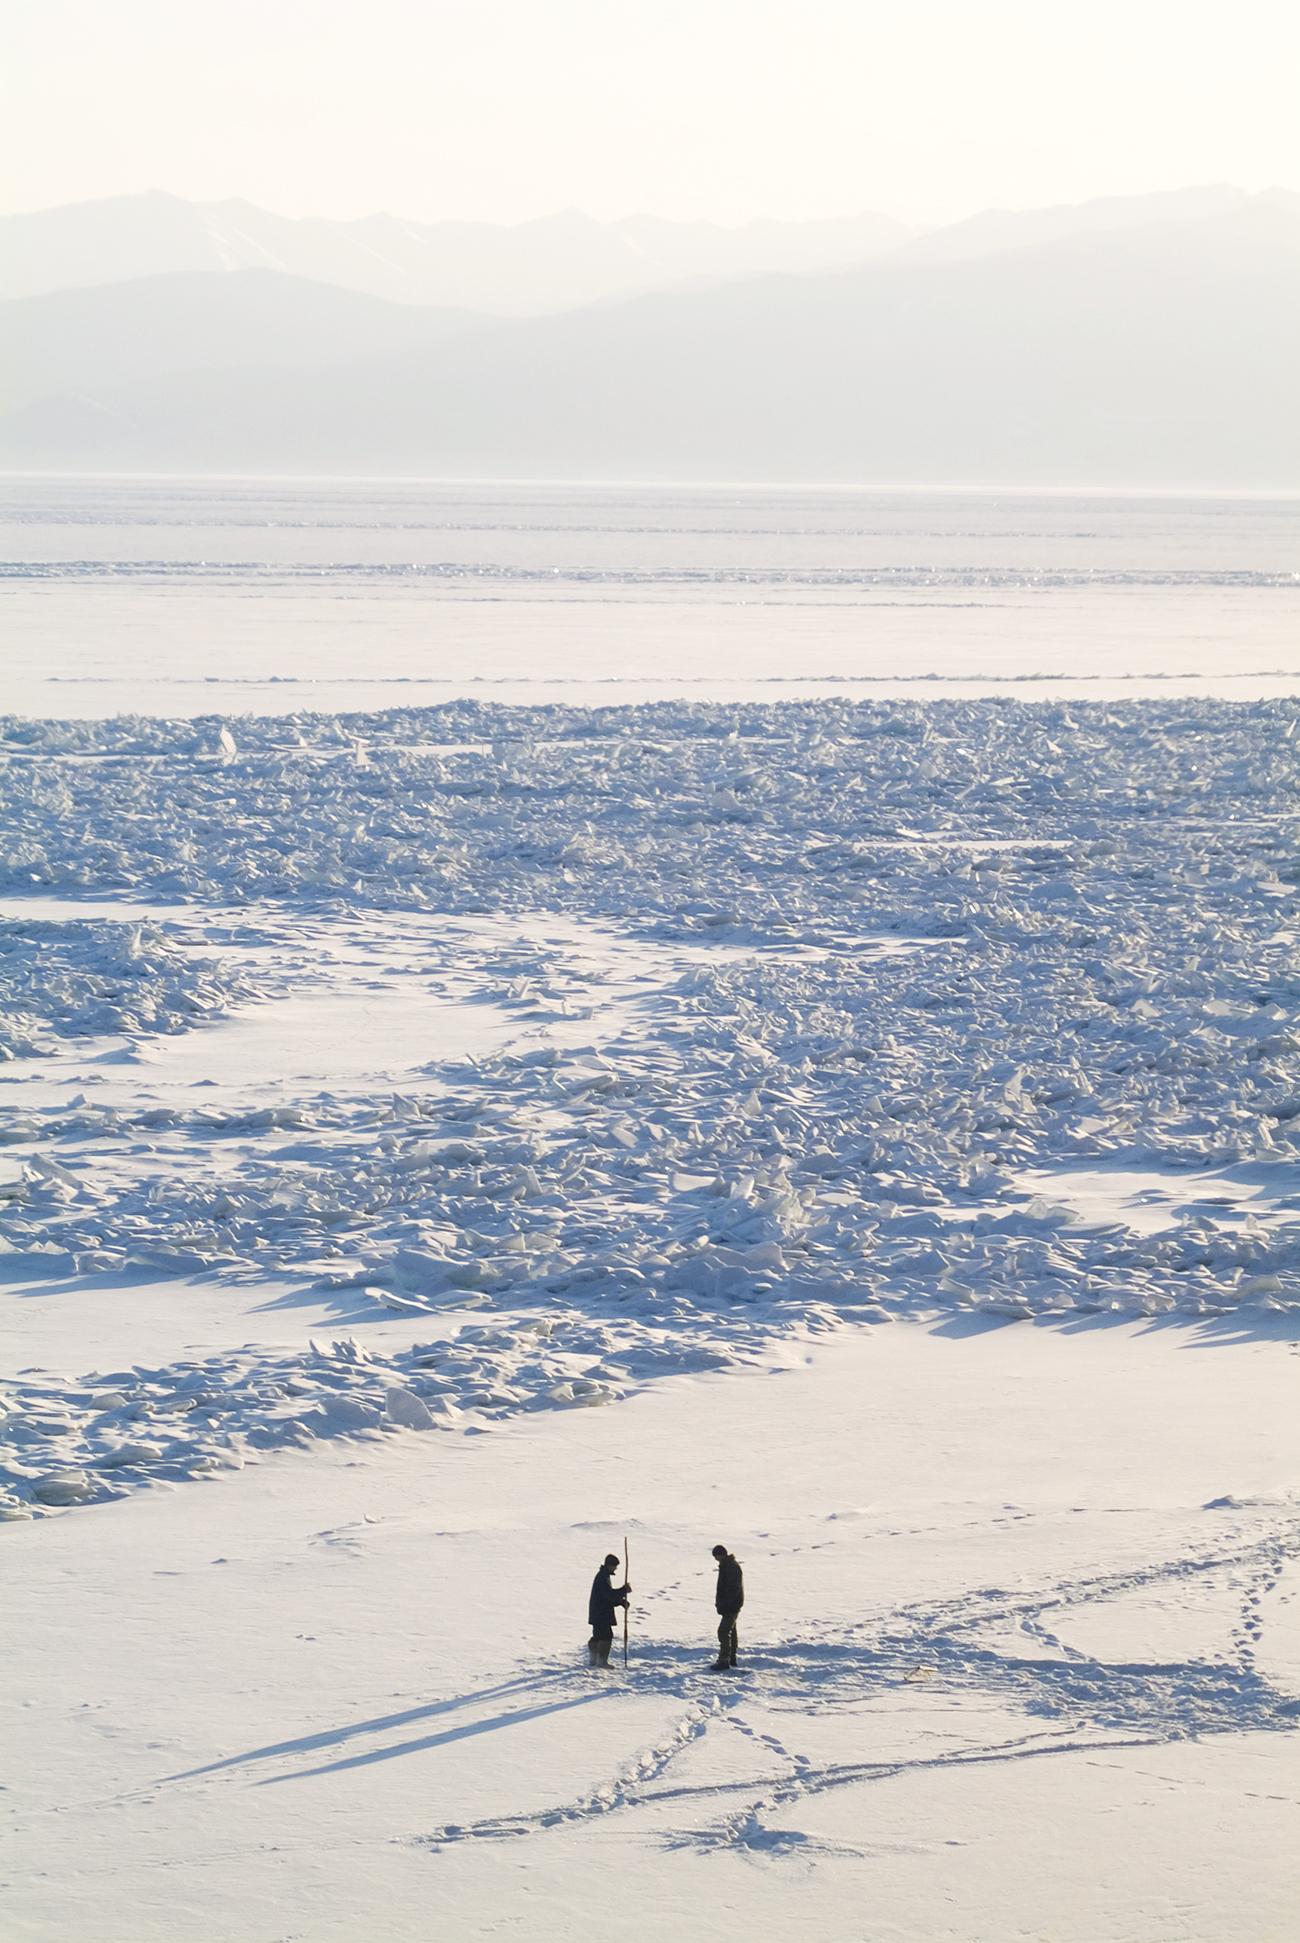 Pescatori tra i ghiacci. Fonte: Konstantin Kokoshkin/Global Look Press